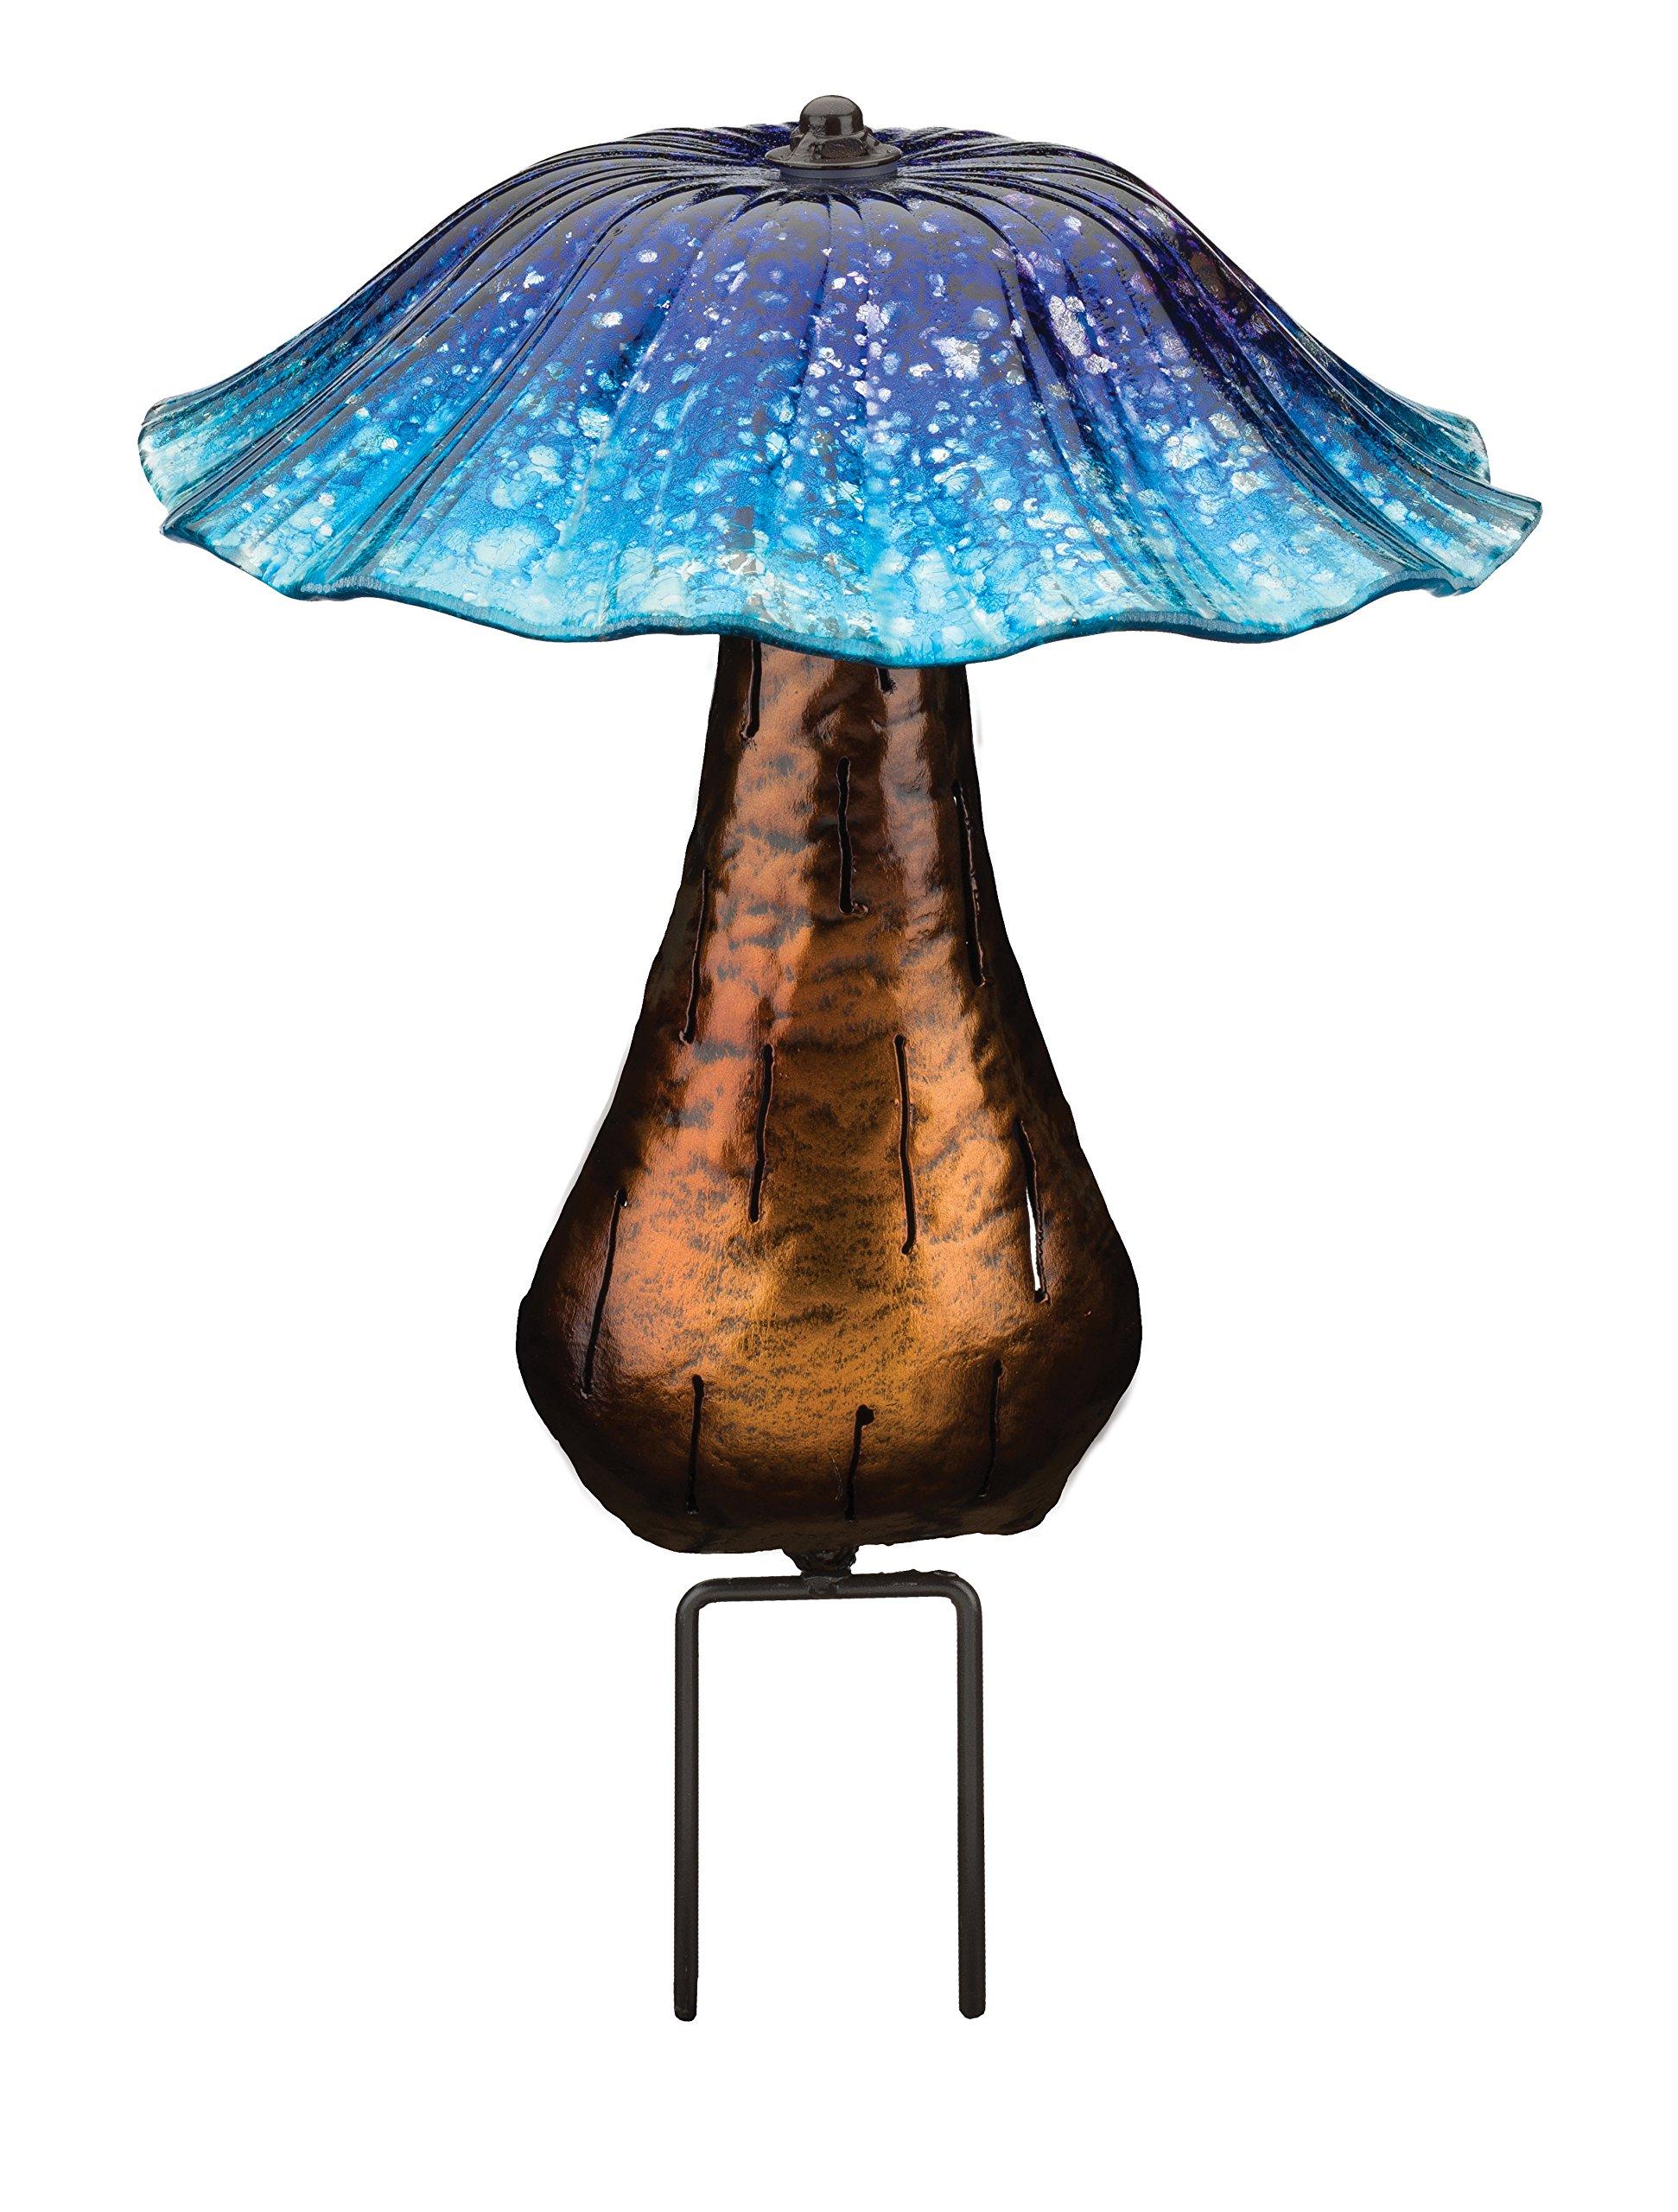 Regal Art & Gift 11611 Toadstool Stake Solar Light Garden Decor, Blue